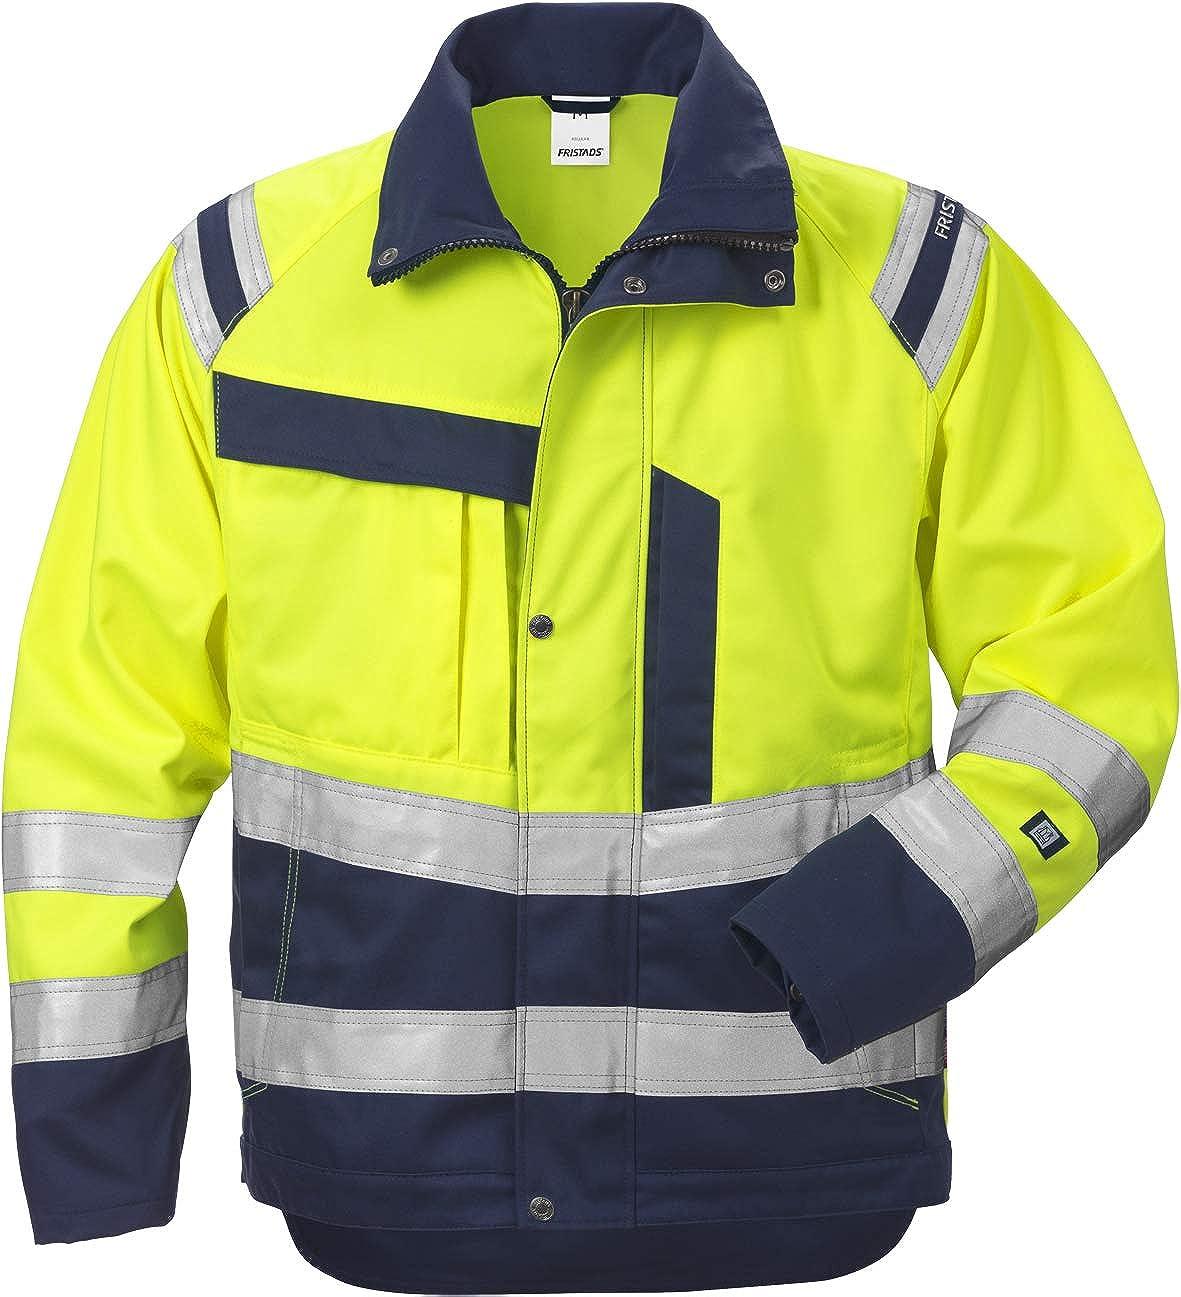 Fristads Kansas Workwear 119623 High Vis Work Jacket Hi-Vis Yellow/Navy S